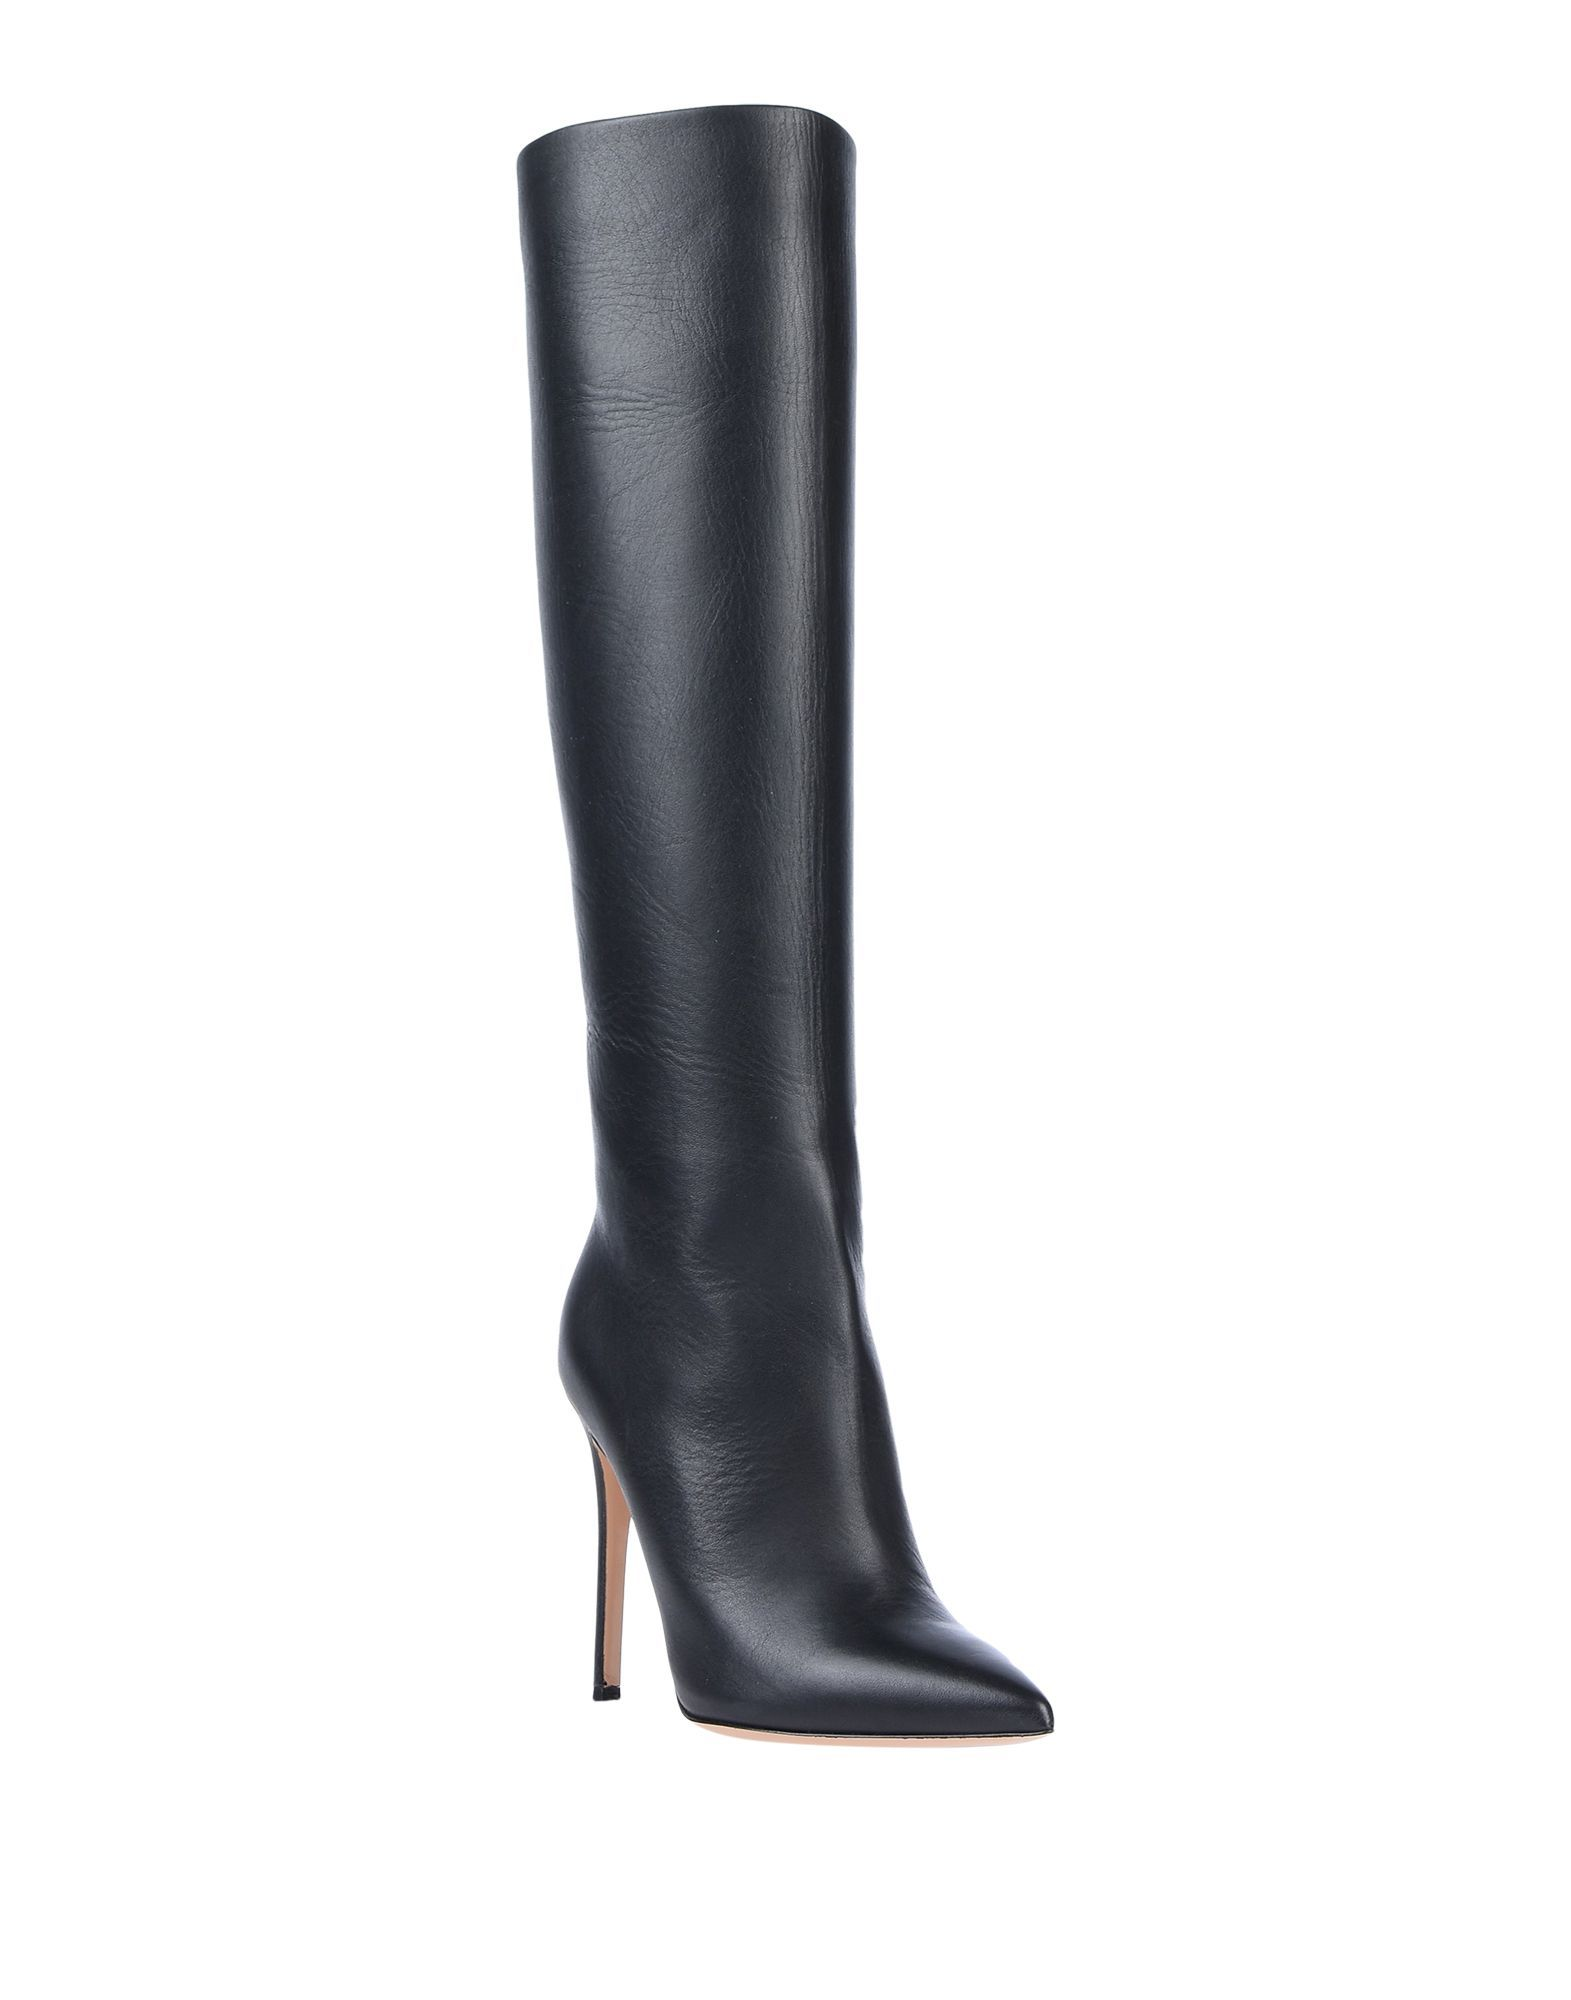 Footwear Lerre Black Women's Calf